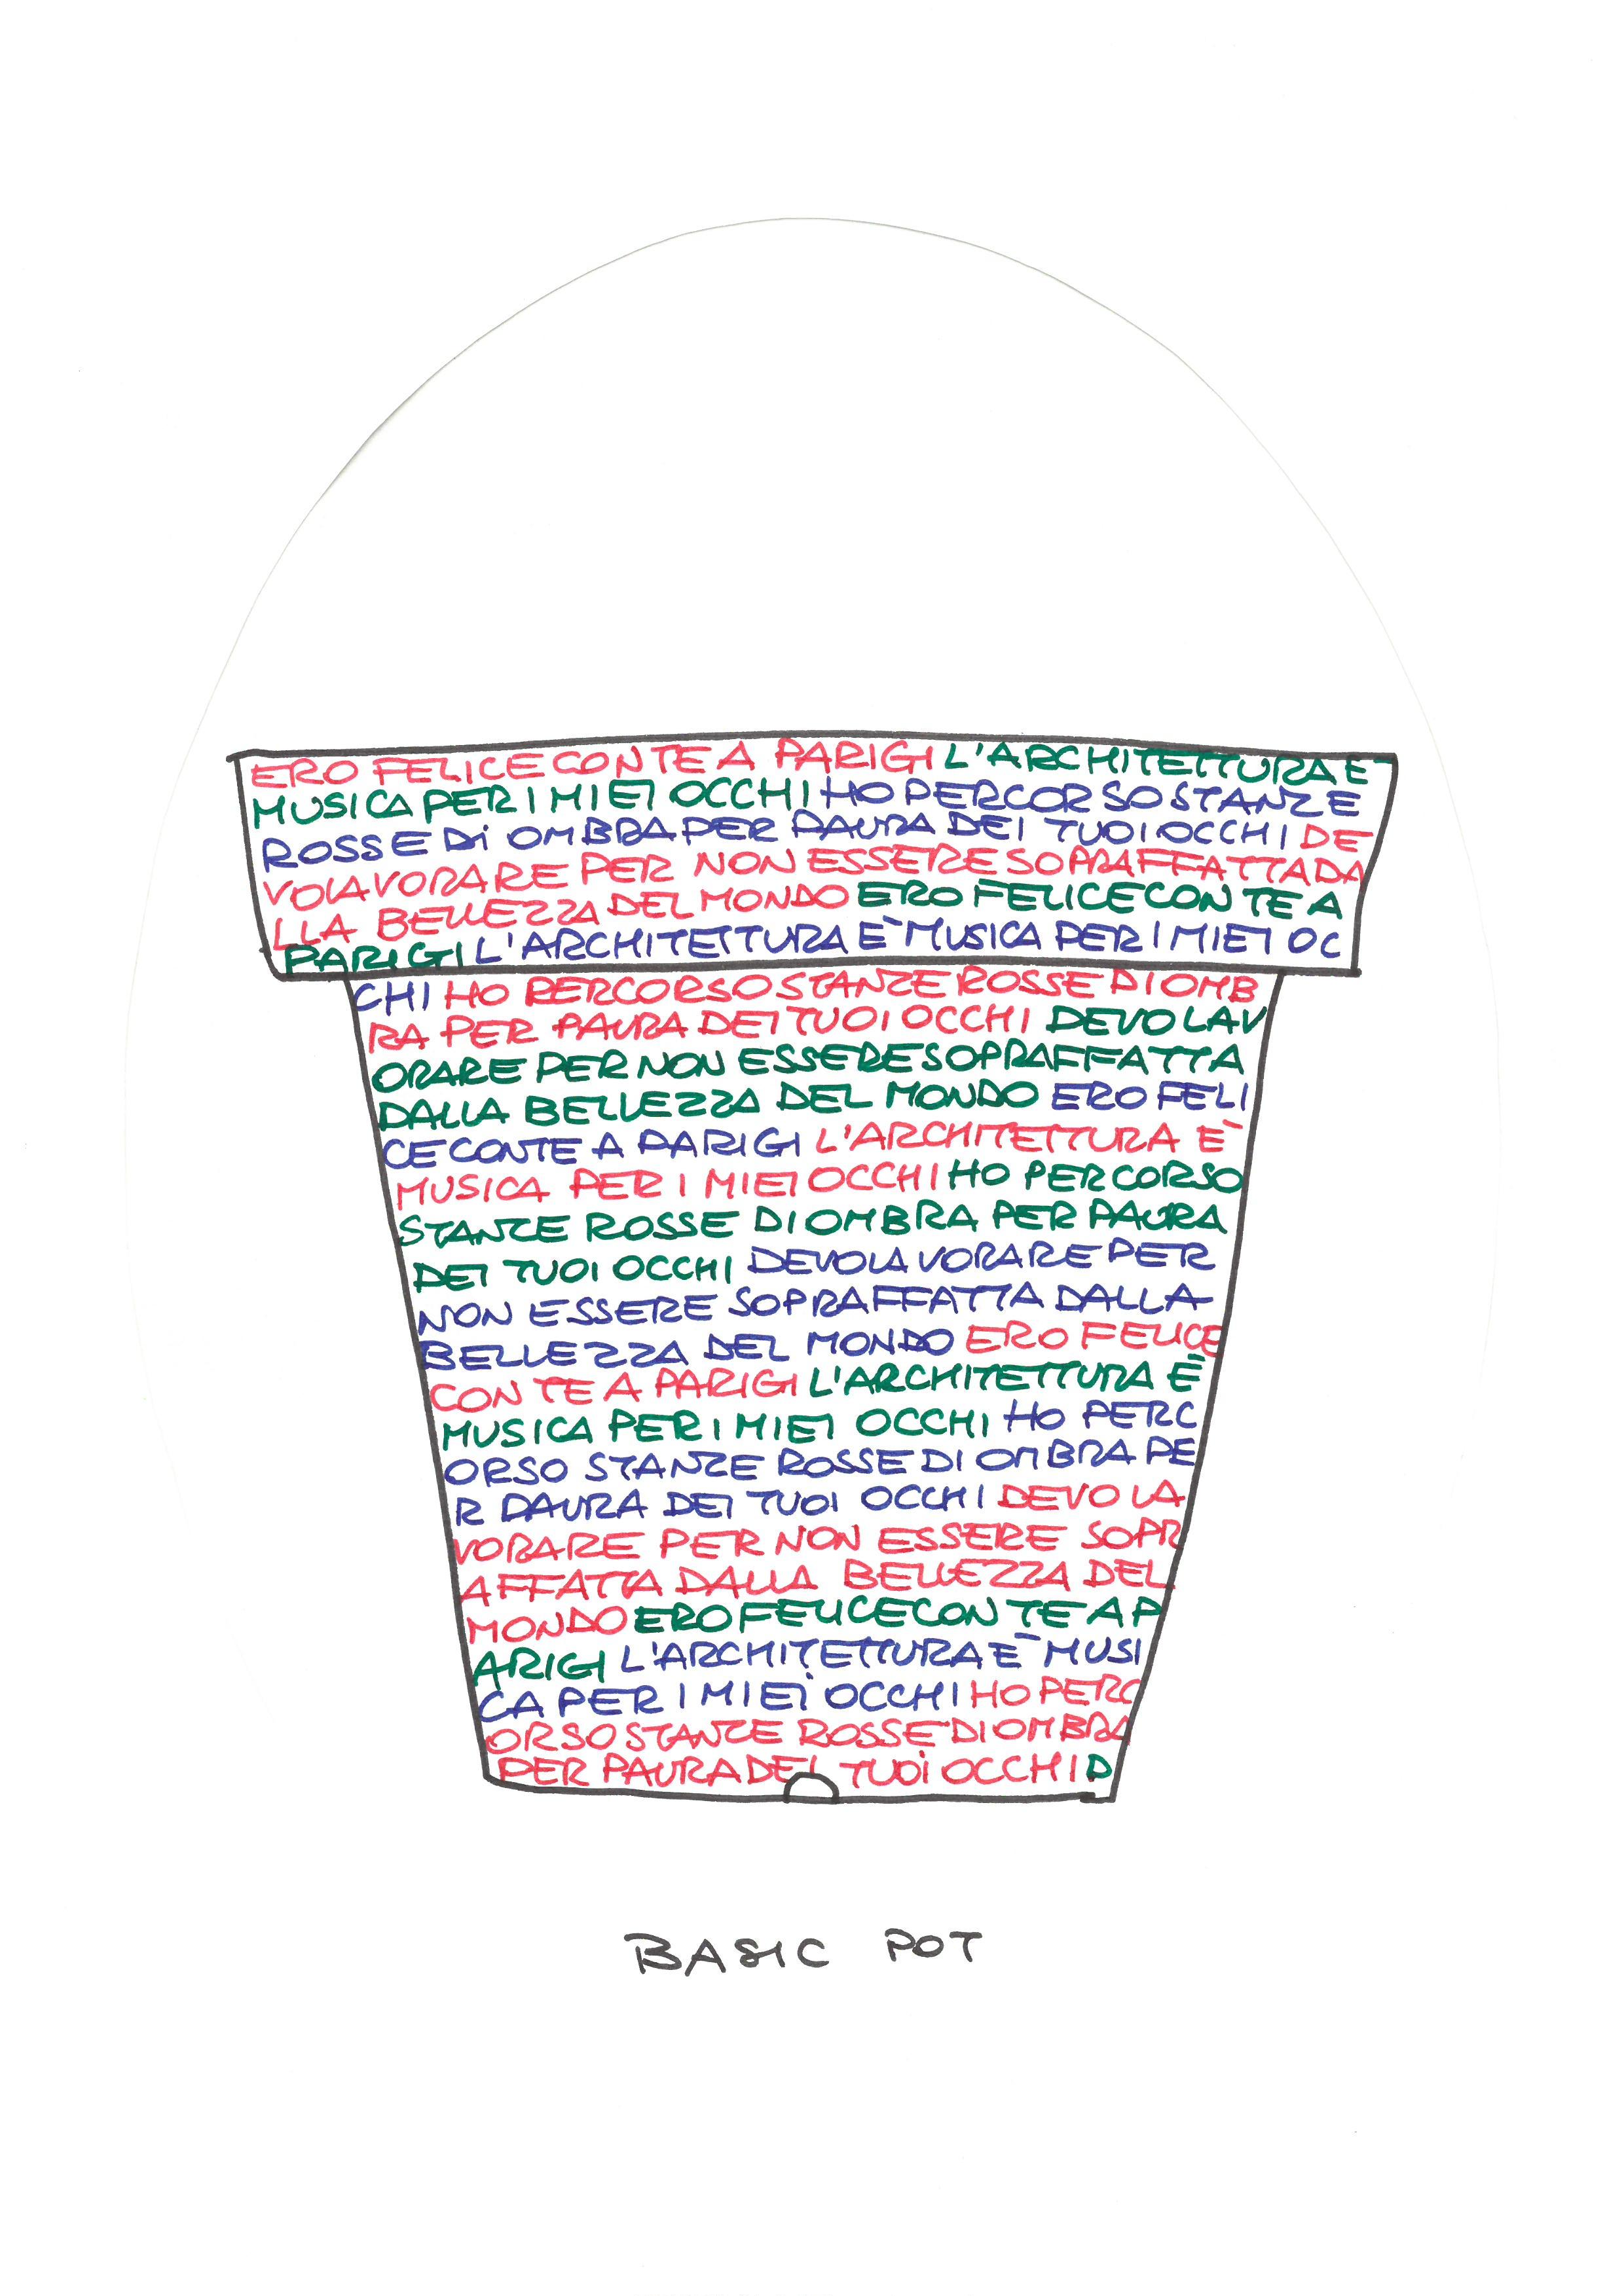 Basic Pot